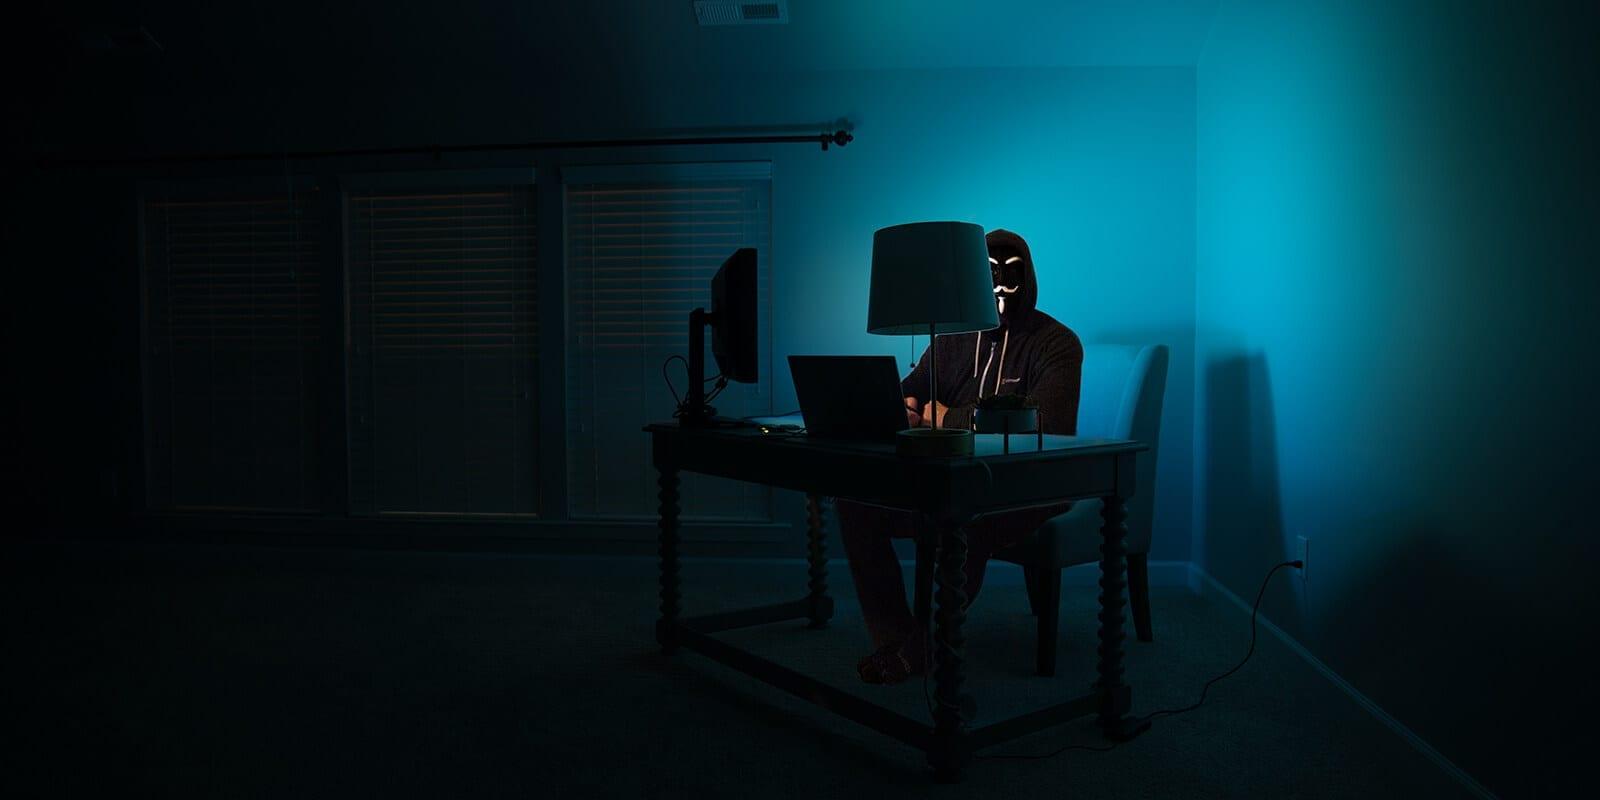 Man in the dark on computer - Password hacking